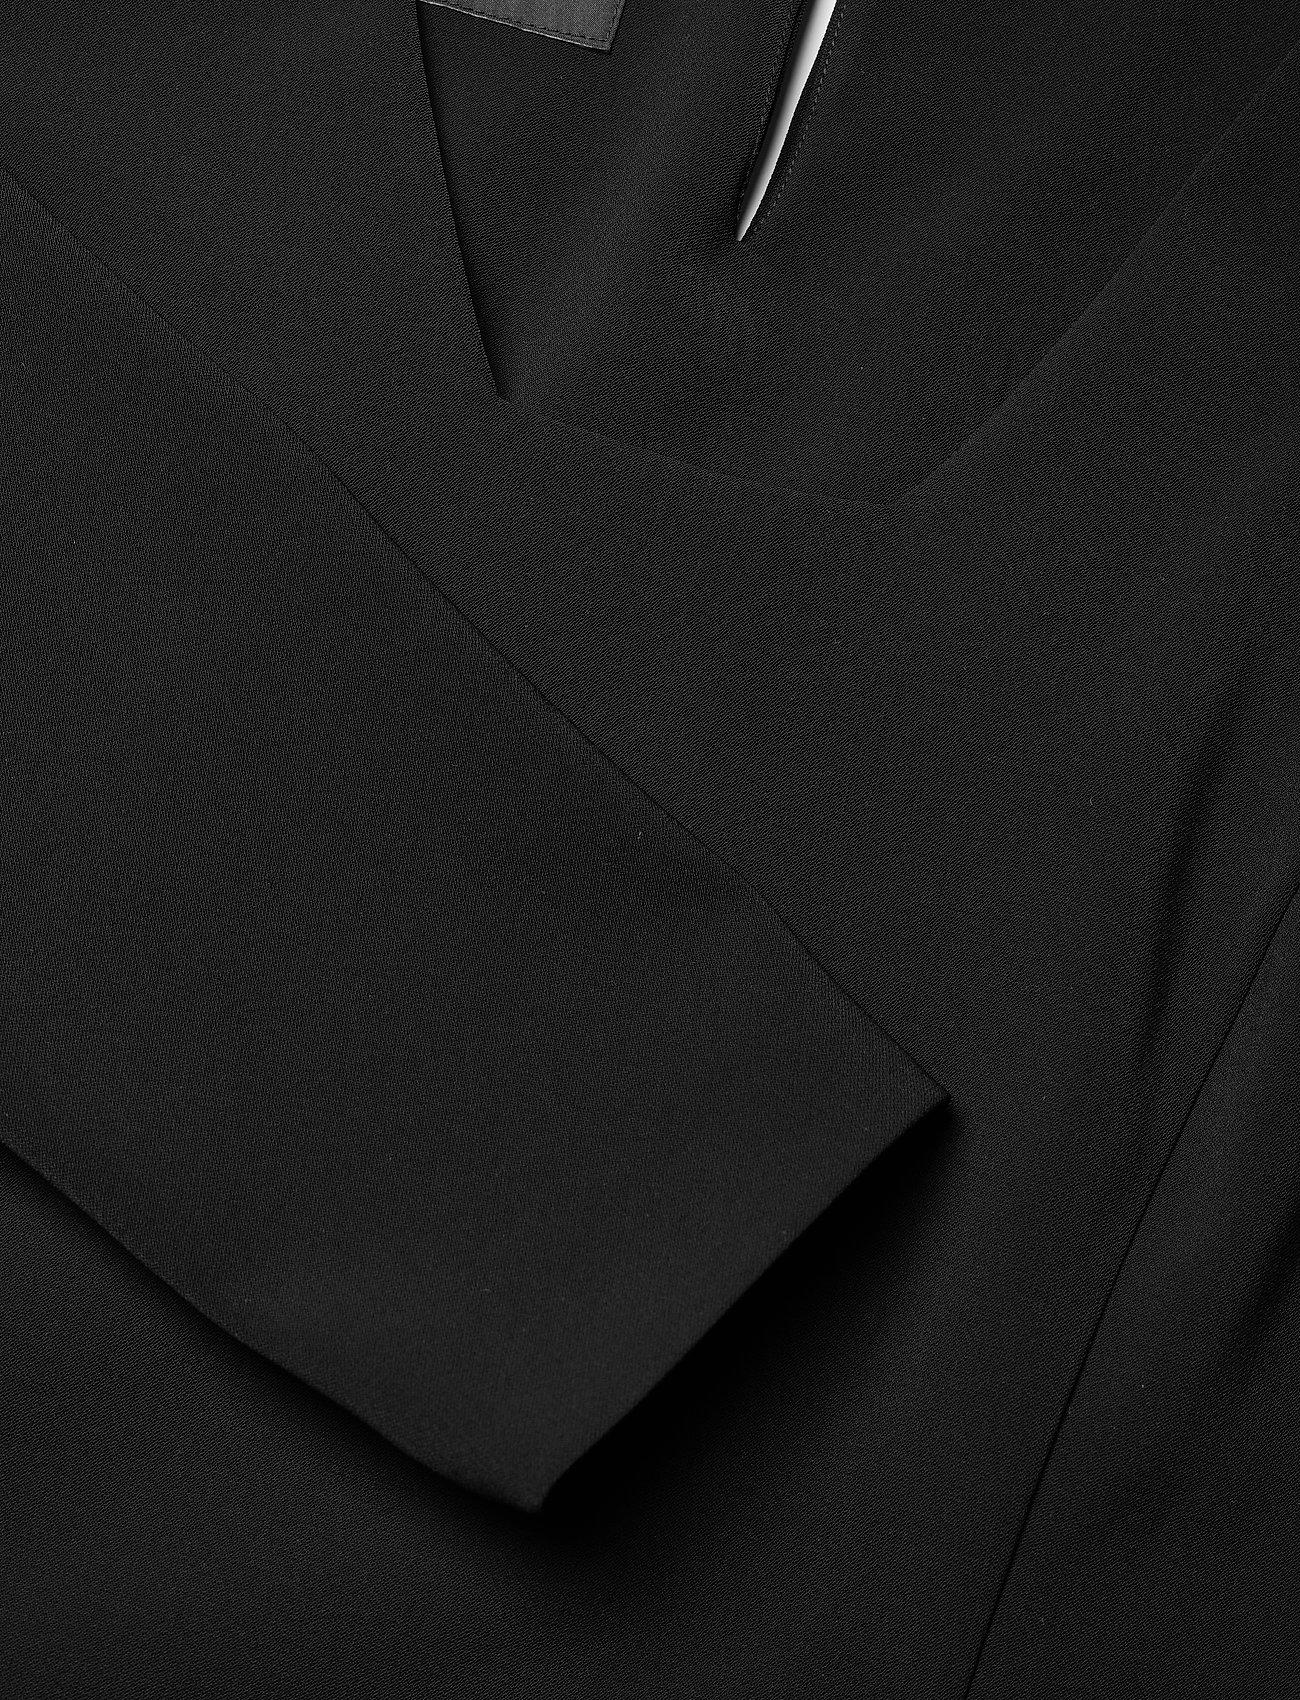 Boutique Moschino - Boutique Moschino DRESS - cocktailkjoler - black - 2